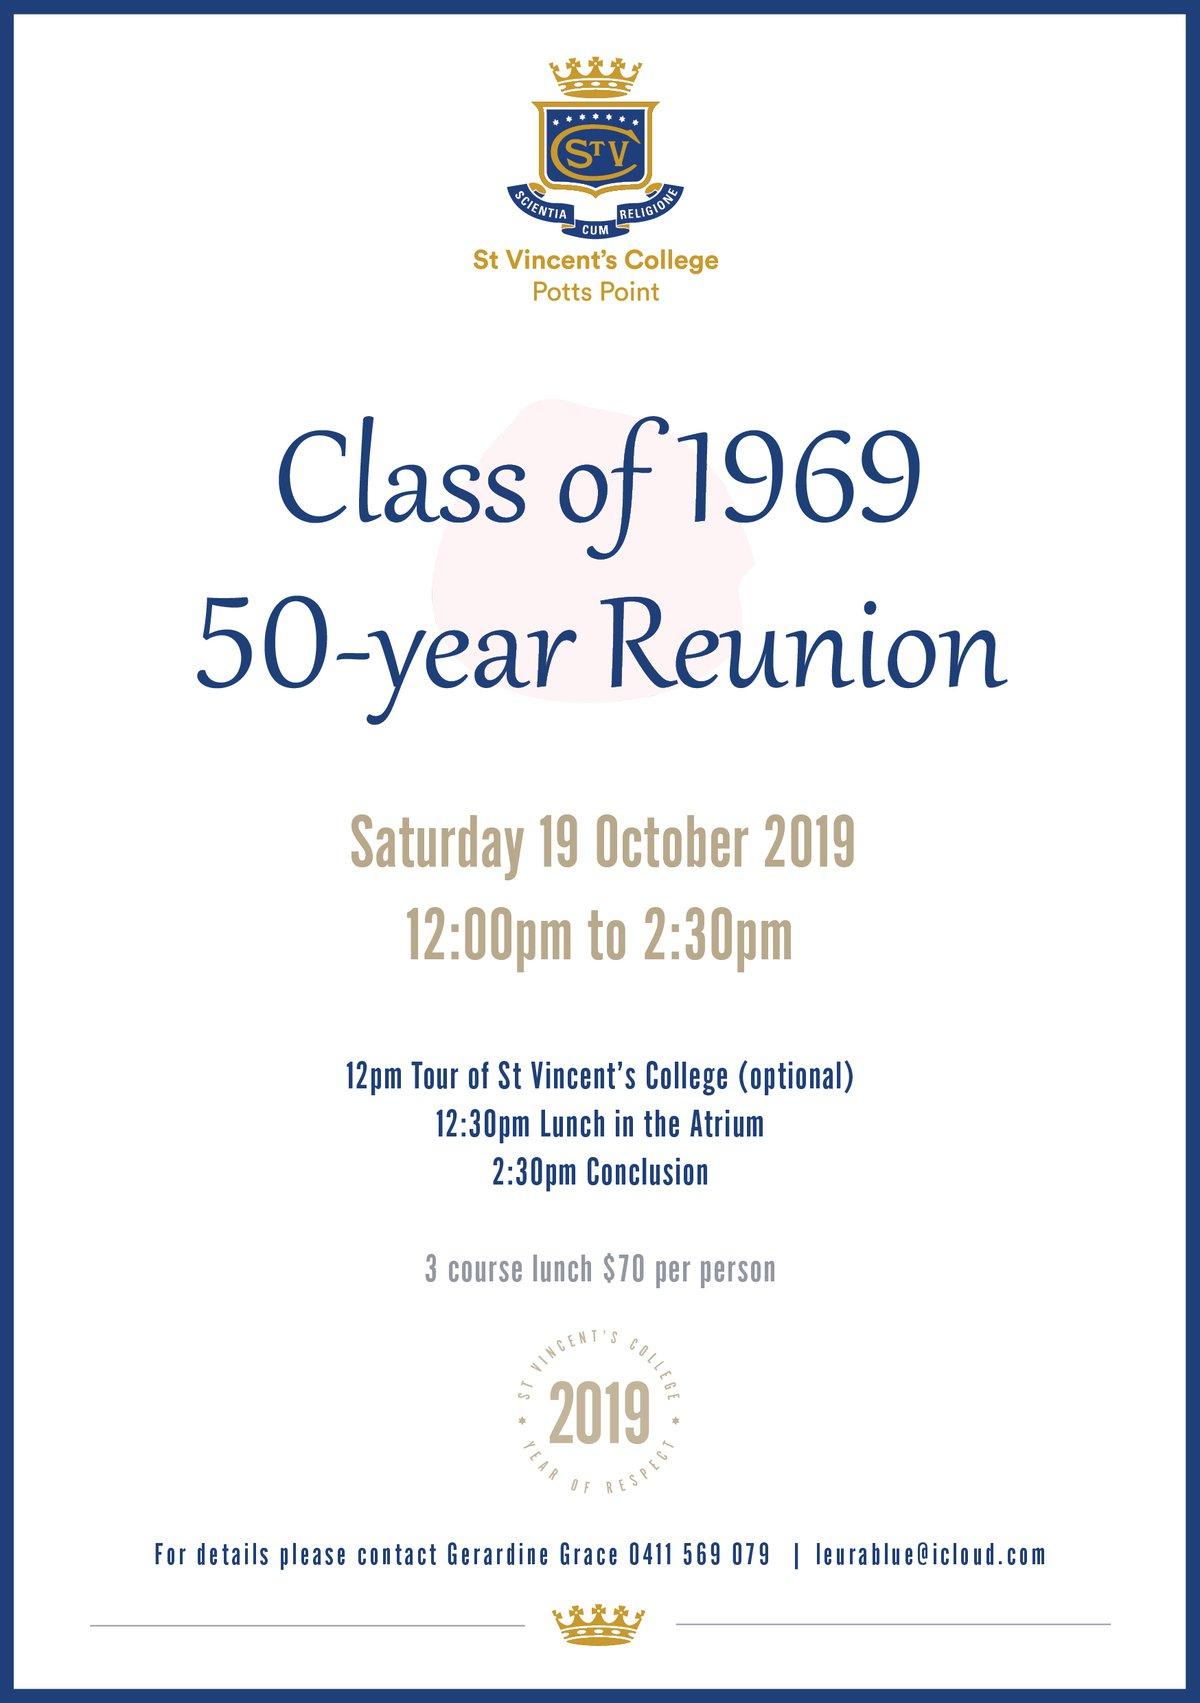 Class of 1969 50th Reunion